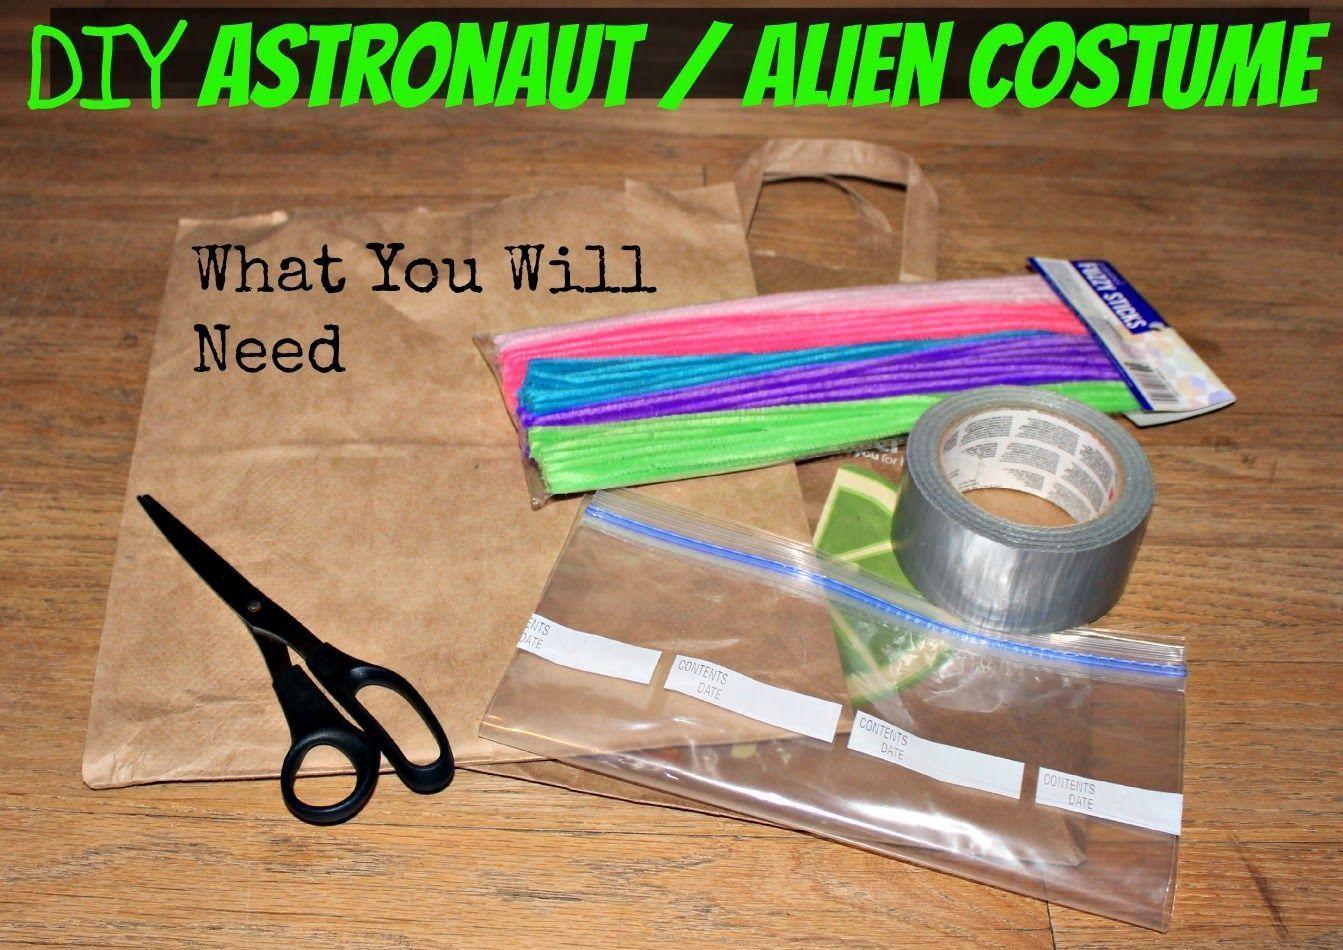 {Denk außerhalb der Spielzeugkiste} Summer Fun Series Paper Bags DIY: Astronaut / Alien Co ..., #Alien #aliencostume #Astronaut #außerhalb #Bags #Denk #der #DIY #Fun #Paper #Series #Spielzeugkiste #Summer